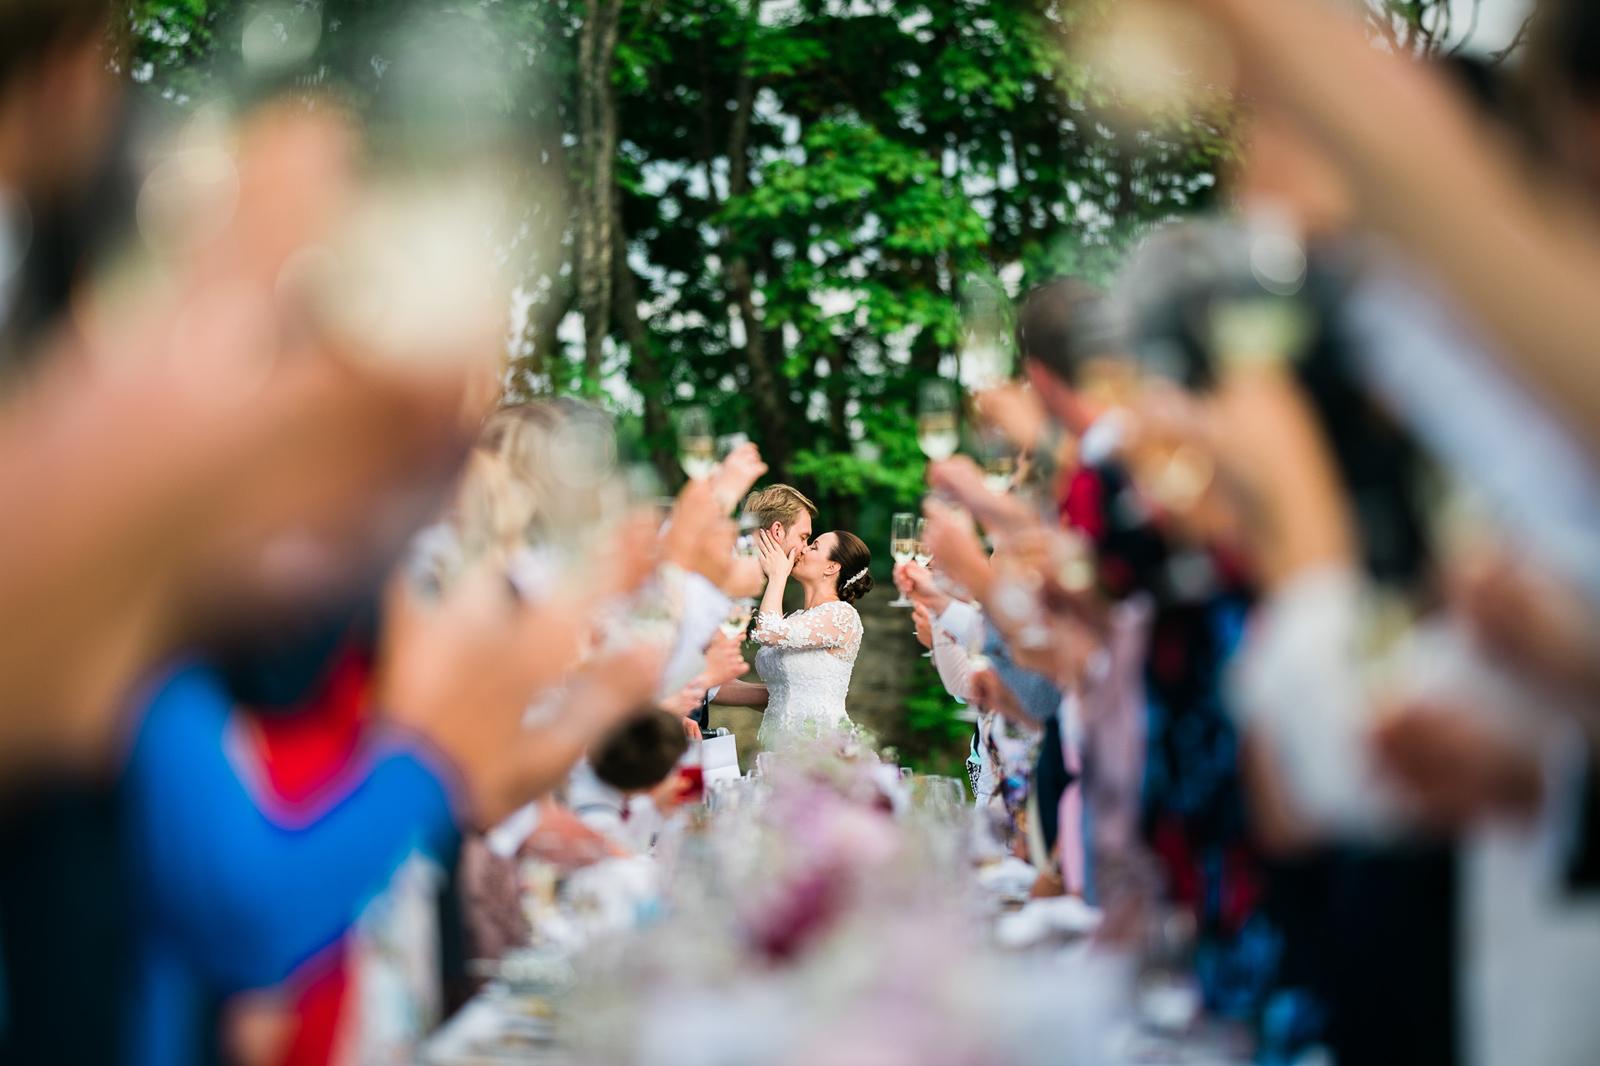 M&J Studios Best Wedding Photos 2017 by Mait Jüriado